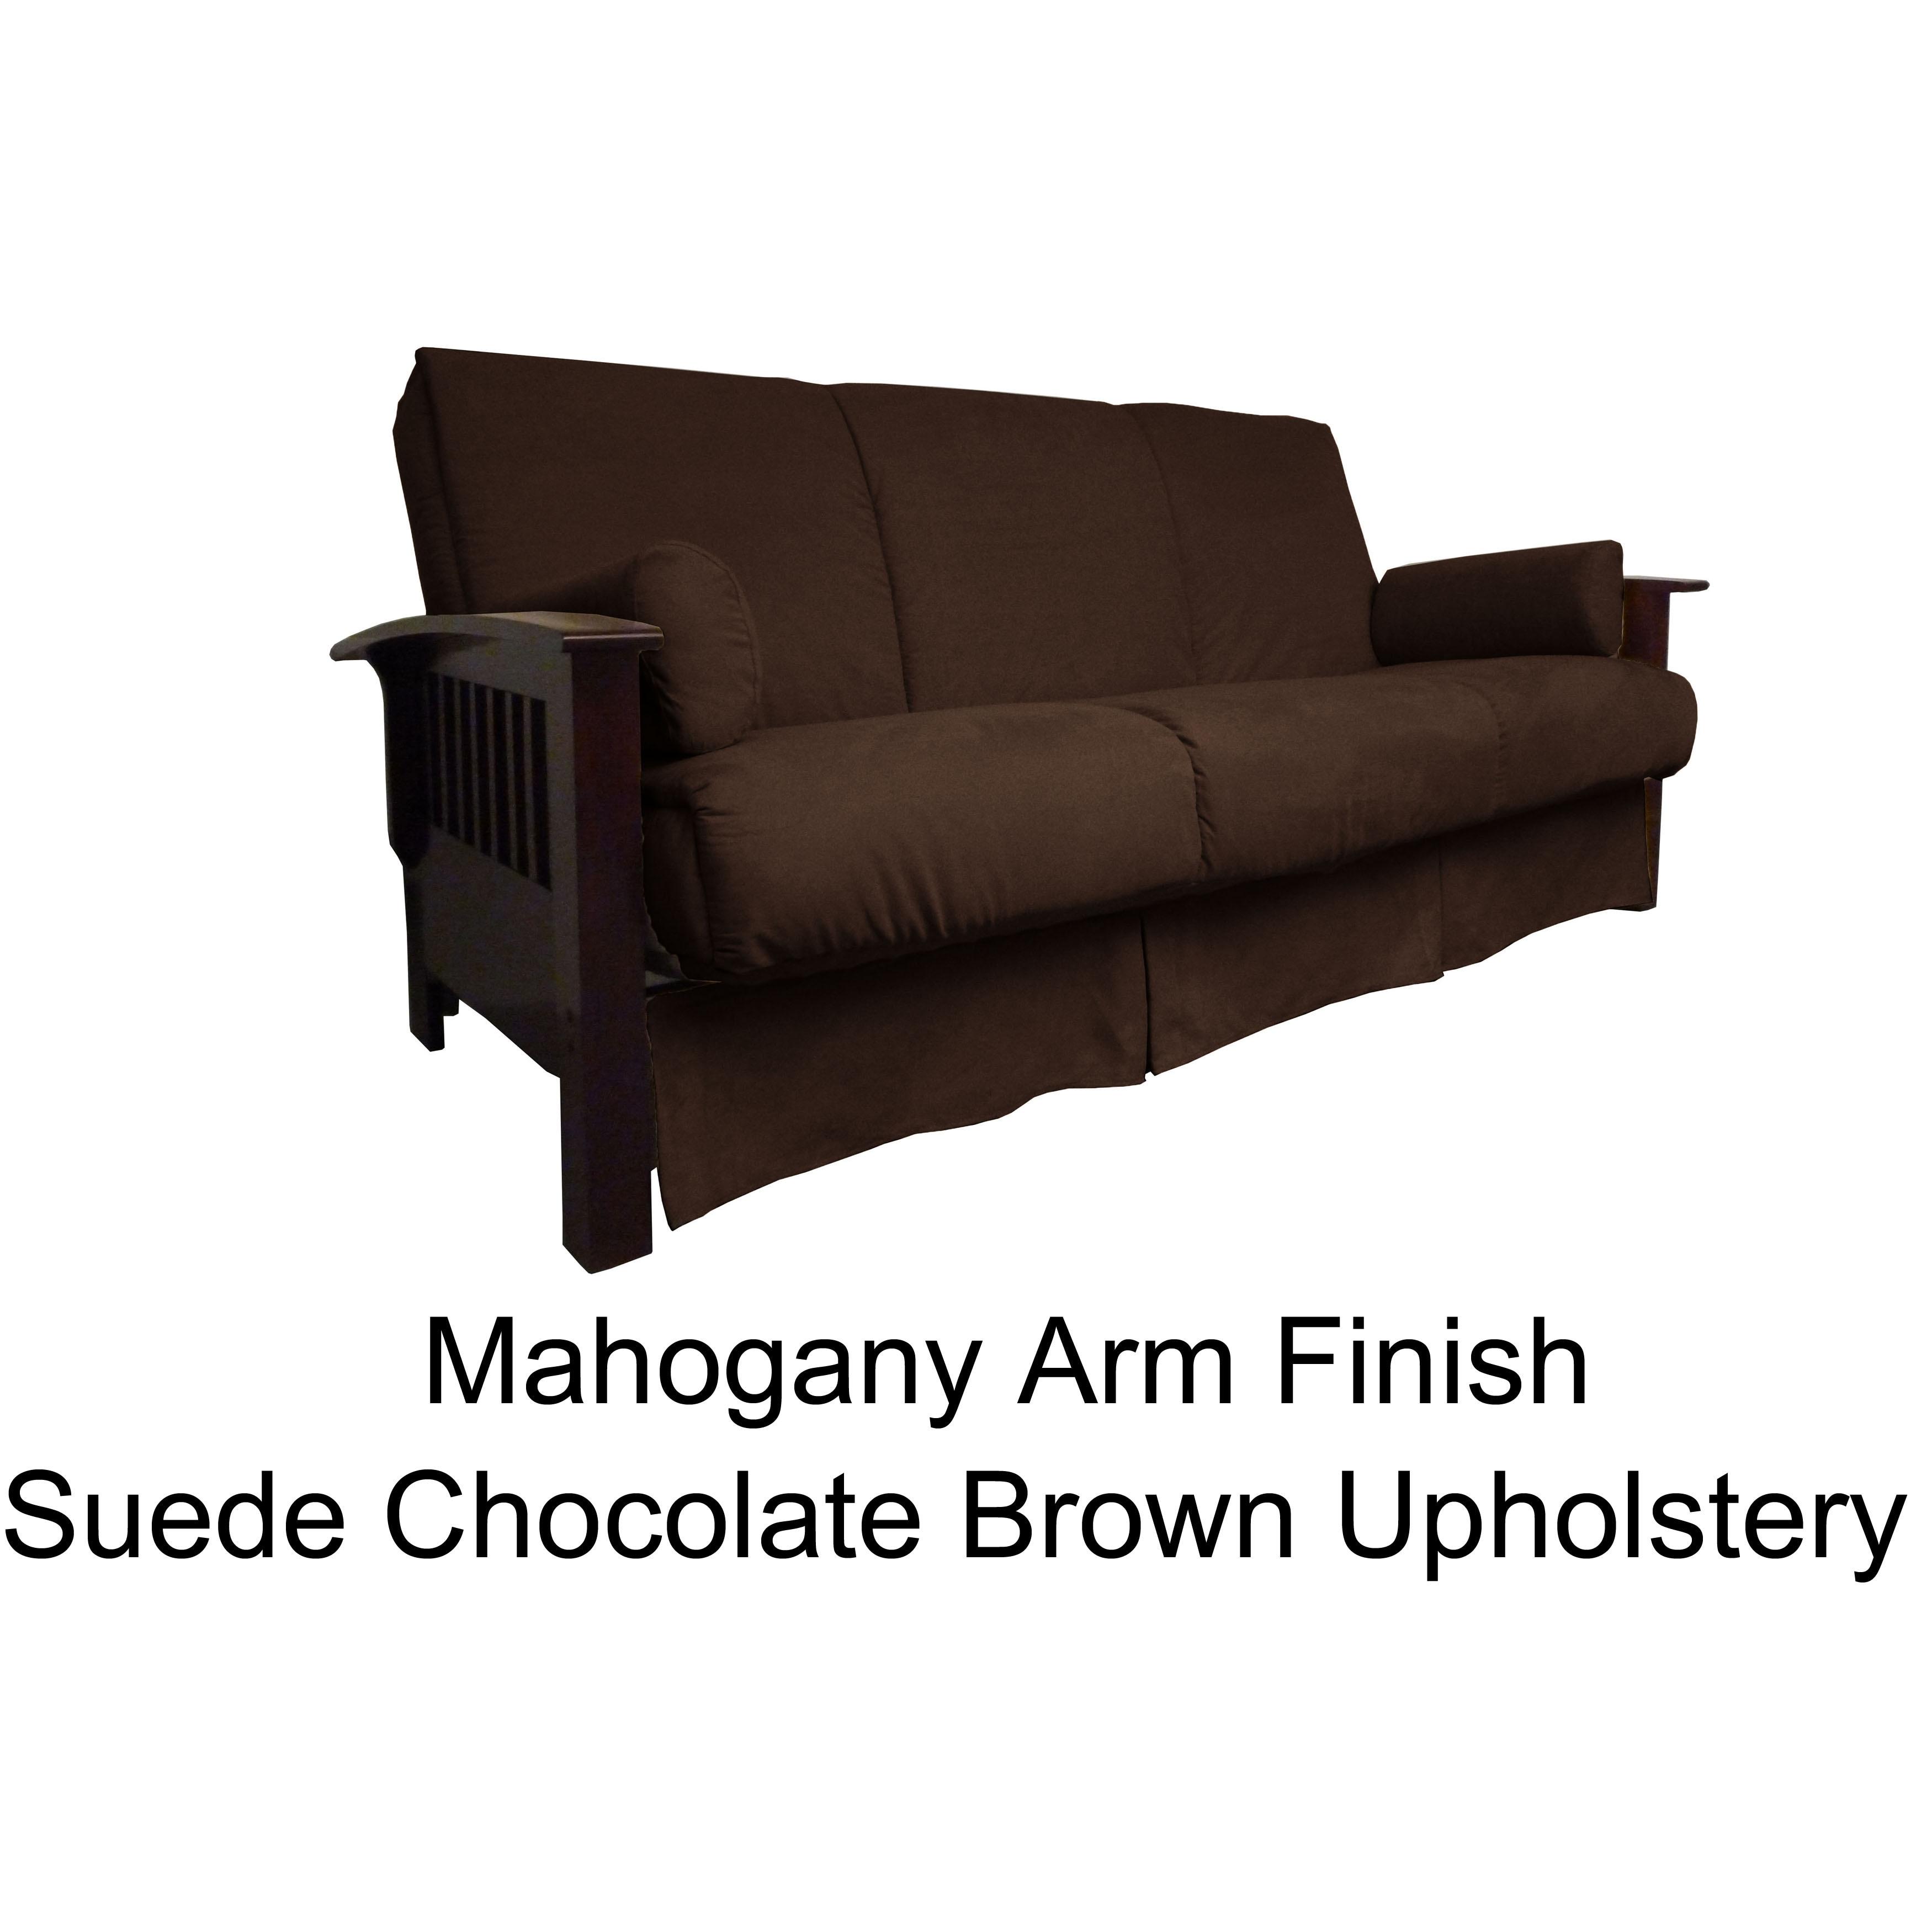 Wondrous Brendan Perfect Sit Sleep Mission Style Pillow Top Queen Sofa Bed Uwap Interior Chair Design Uwaporg